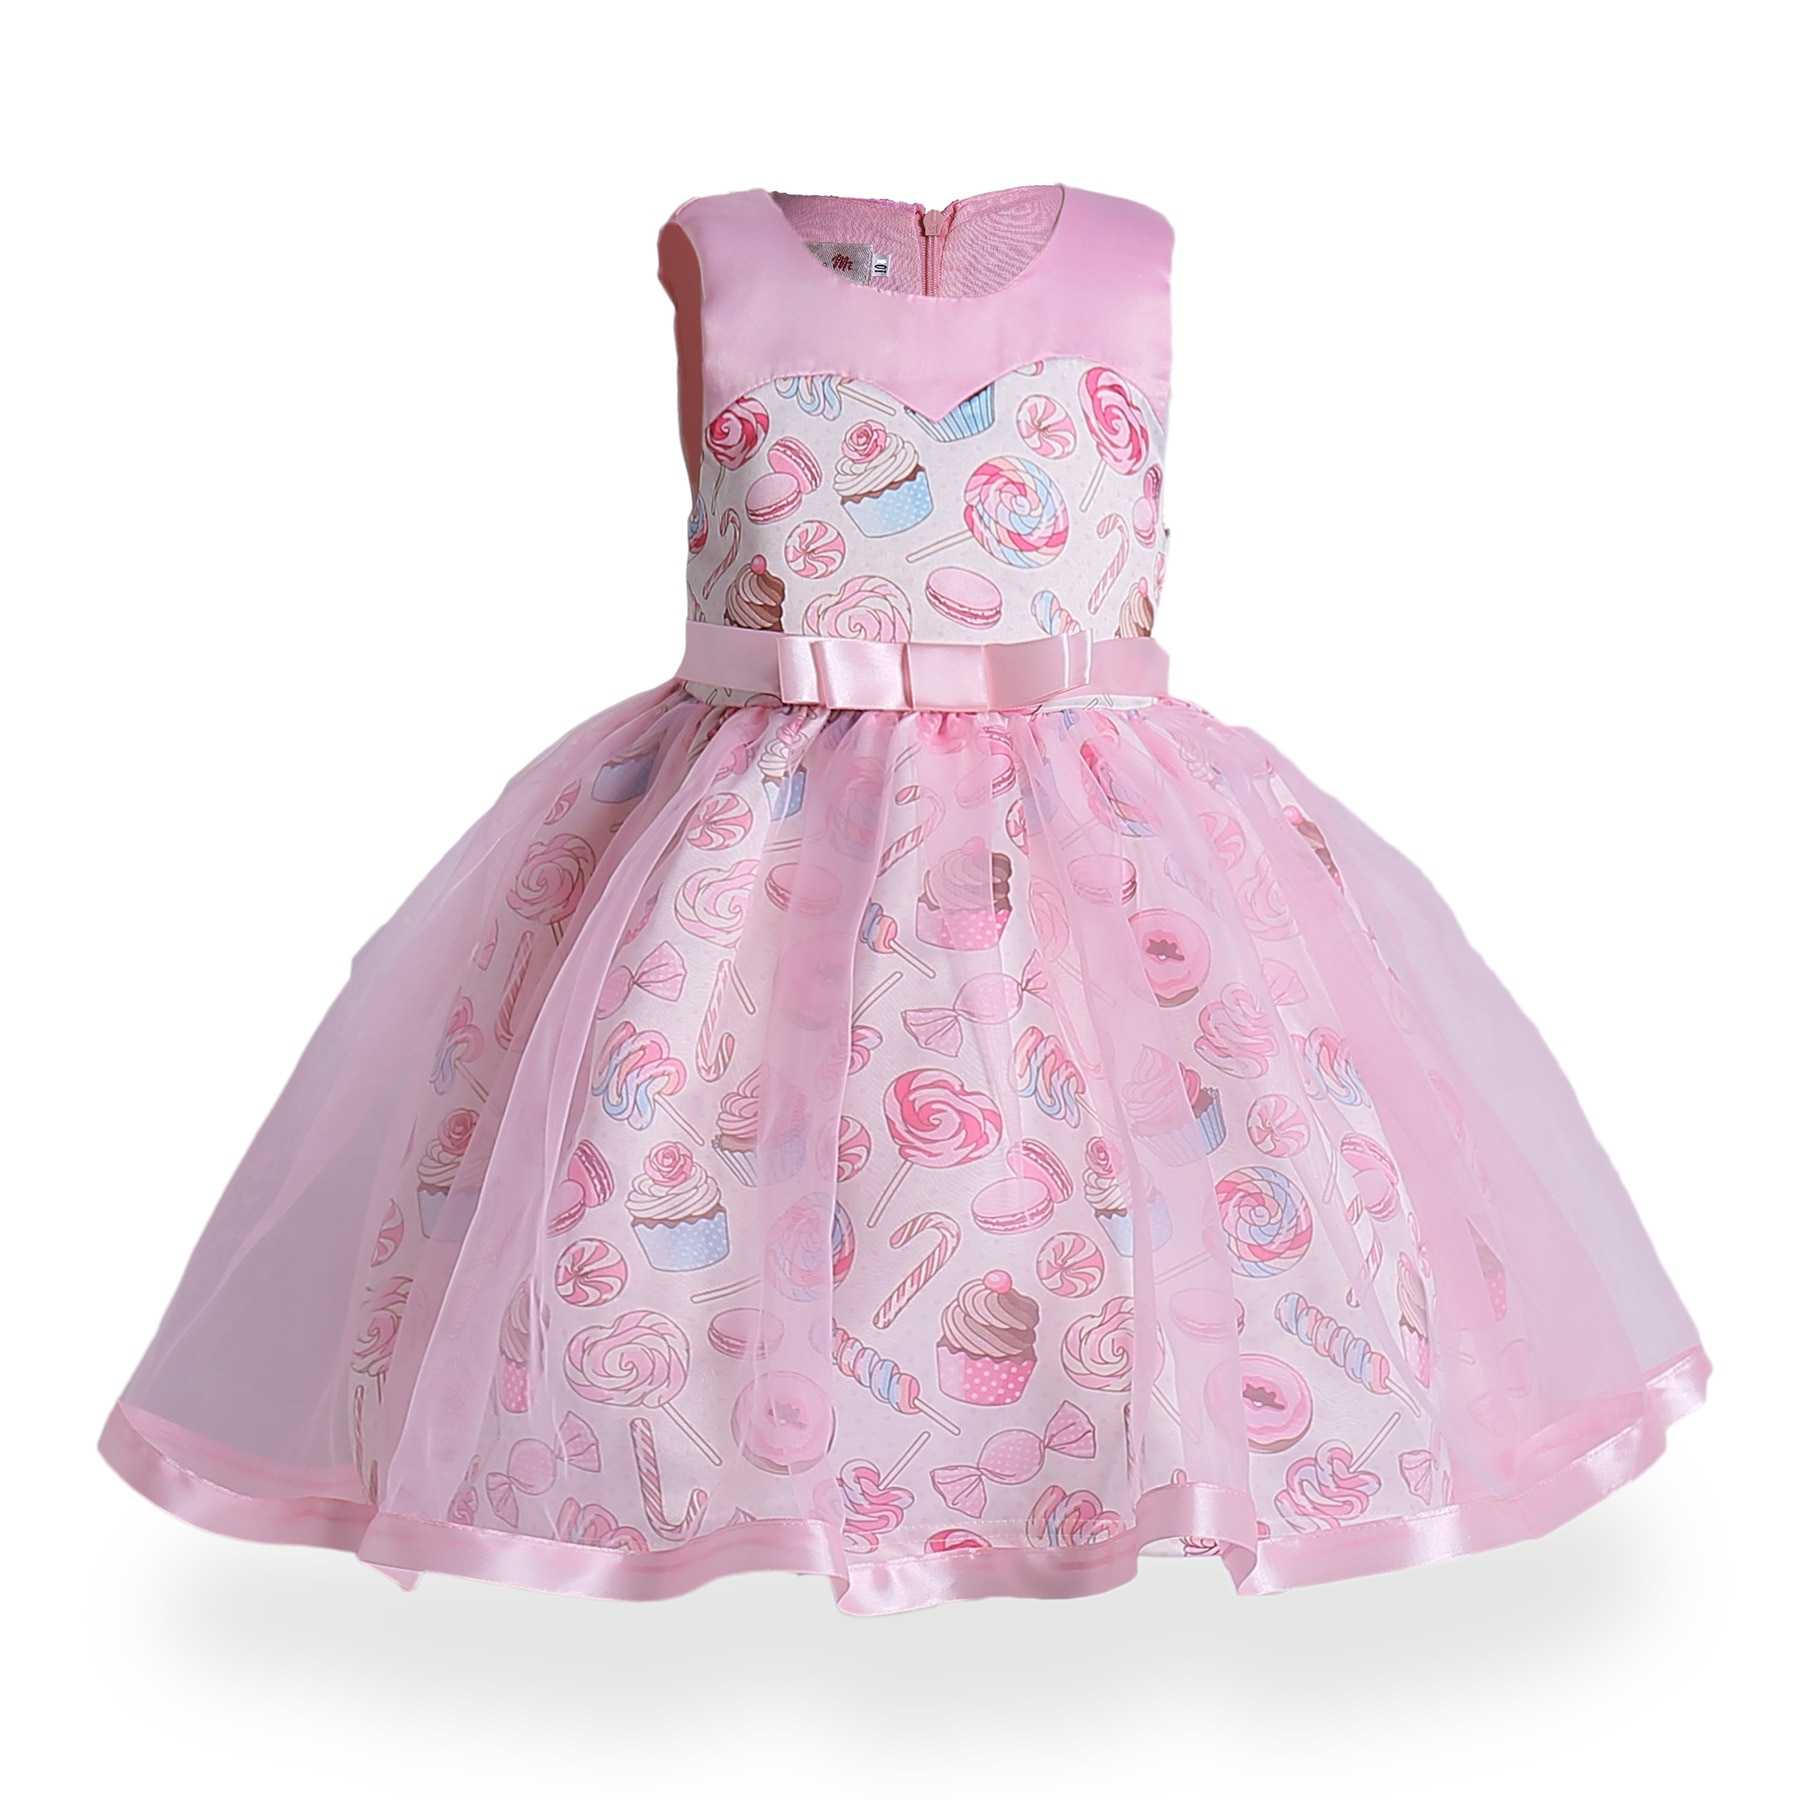 Princesa meninas vestido de aniversário rosa festa de casamento vestidos de bebê fantasia doce cupcake crianças vestidos de sorvete meninas vestido